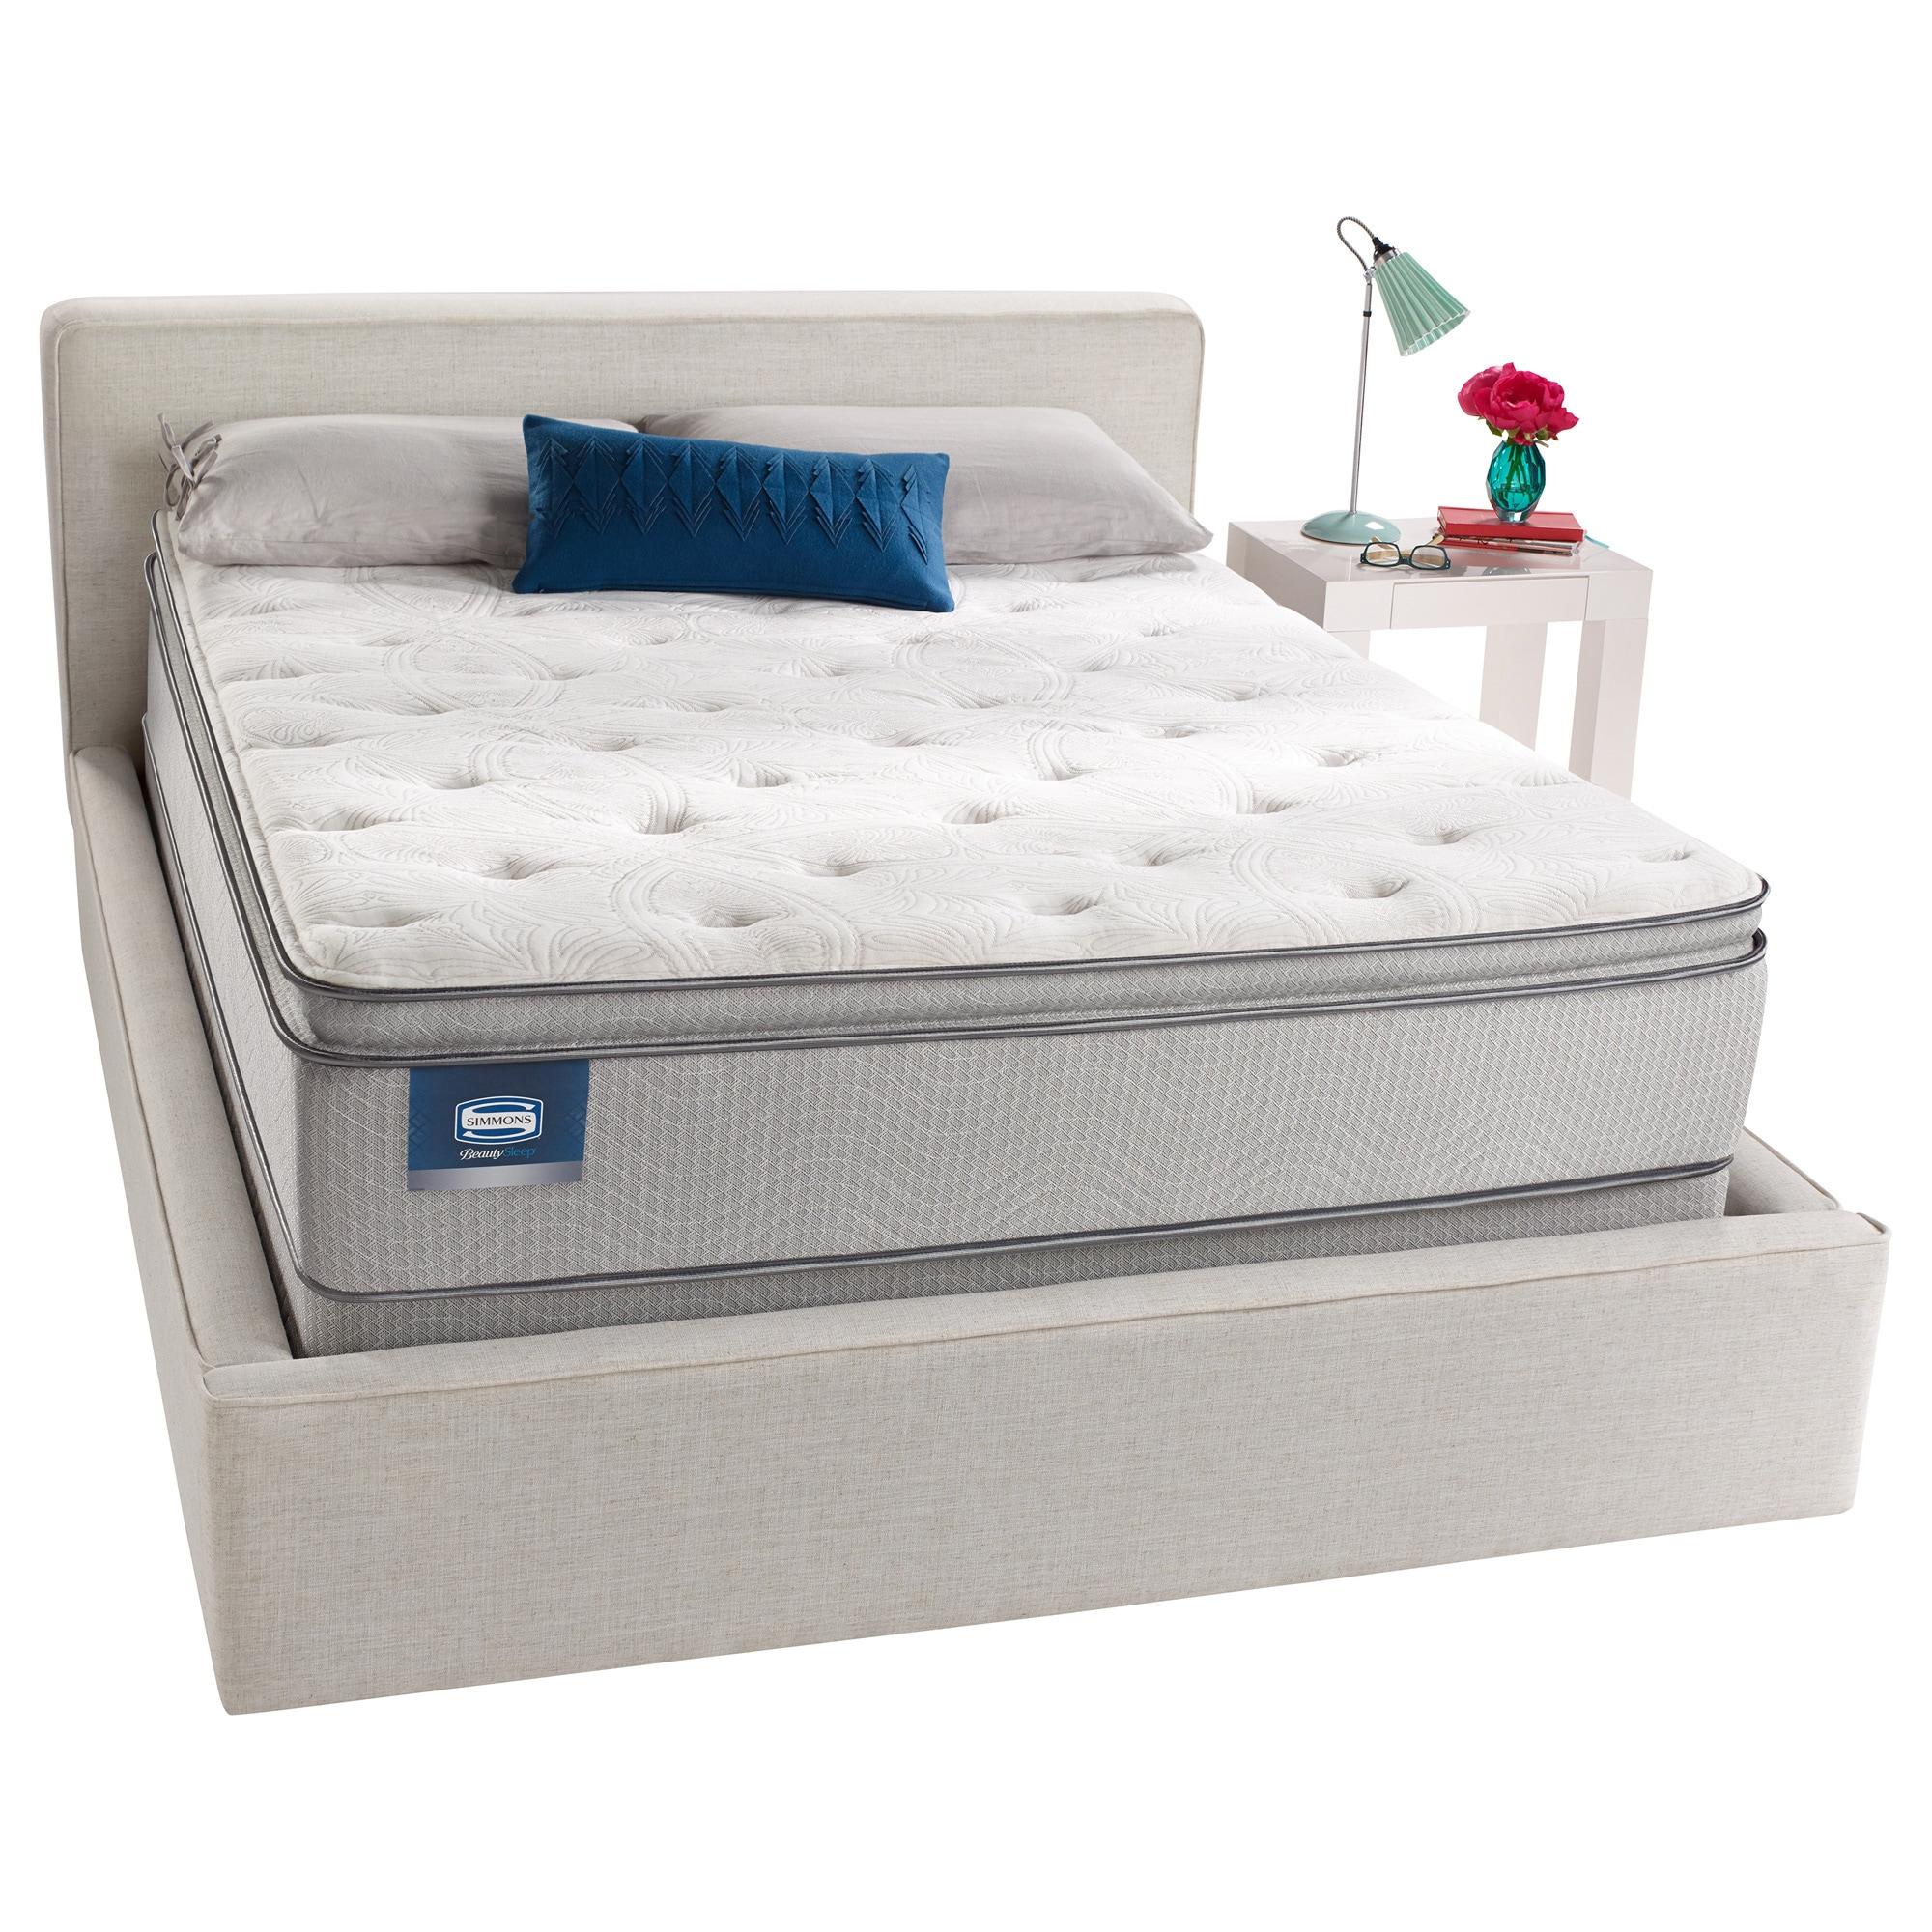 simmons beautysleep titus pillow top full size mattress set